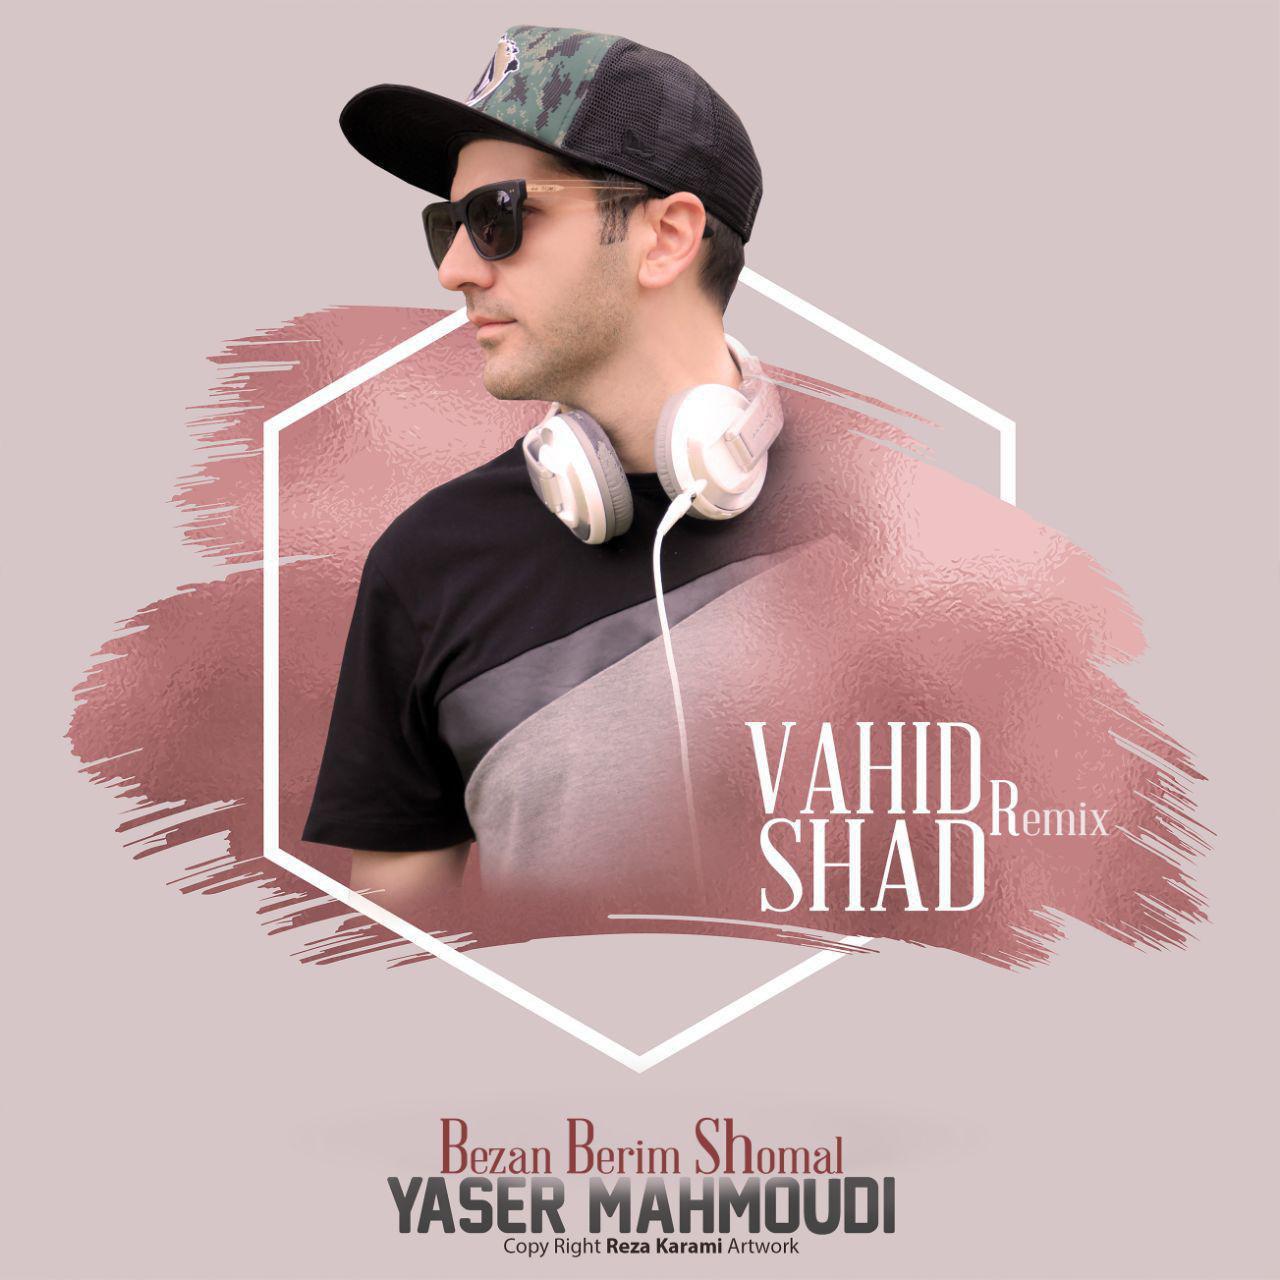 Yaser Mahmoudi – Bezan Berim Shomal (Vahid Shad Remix)